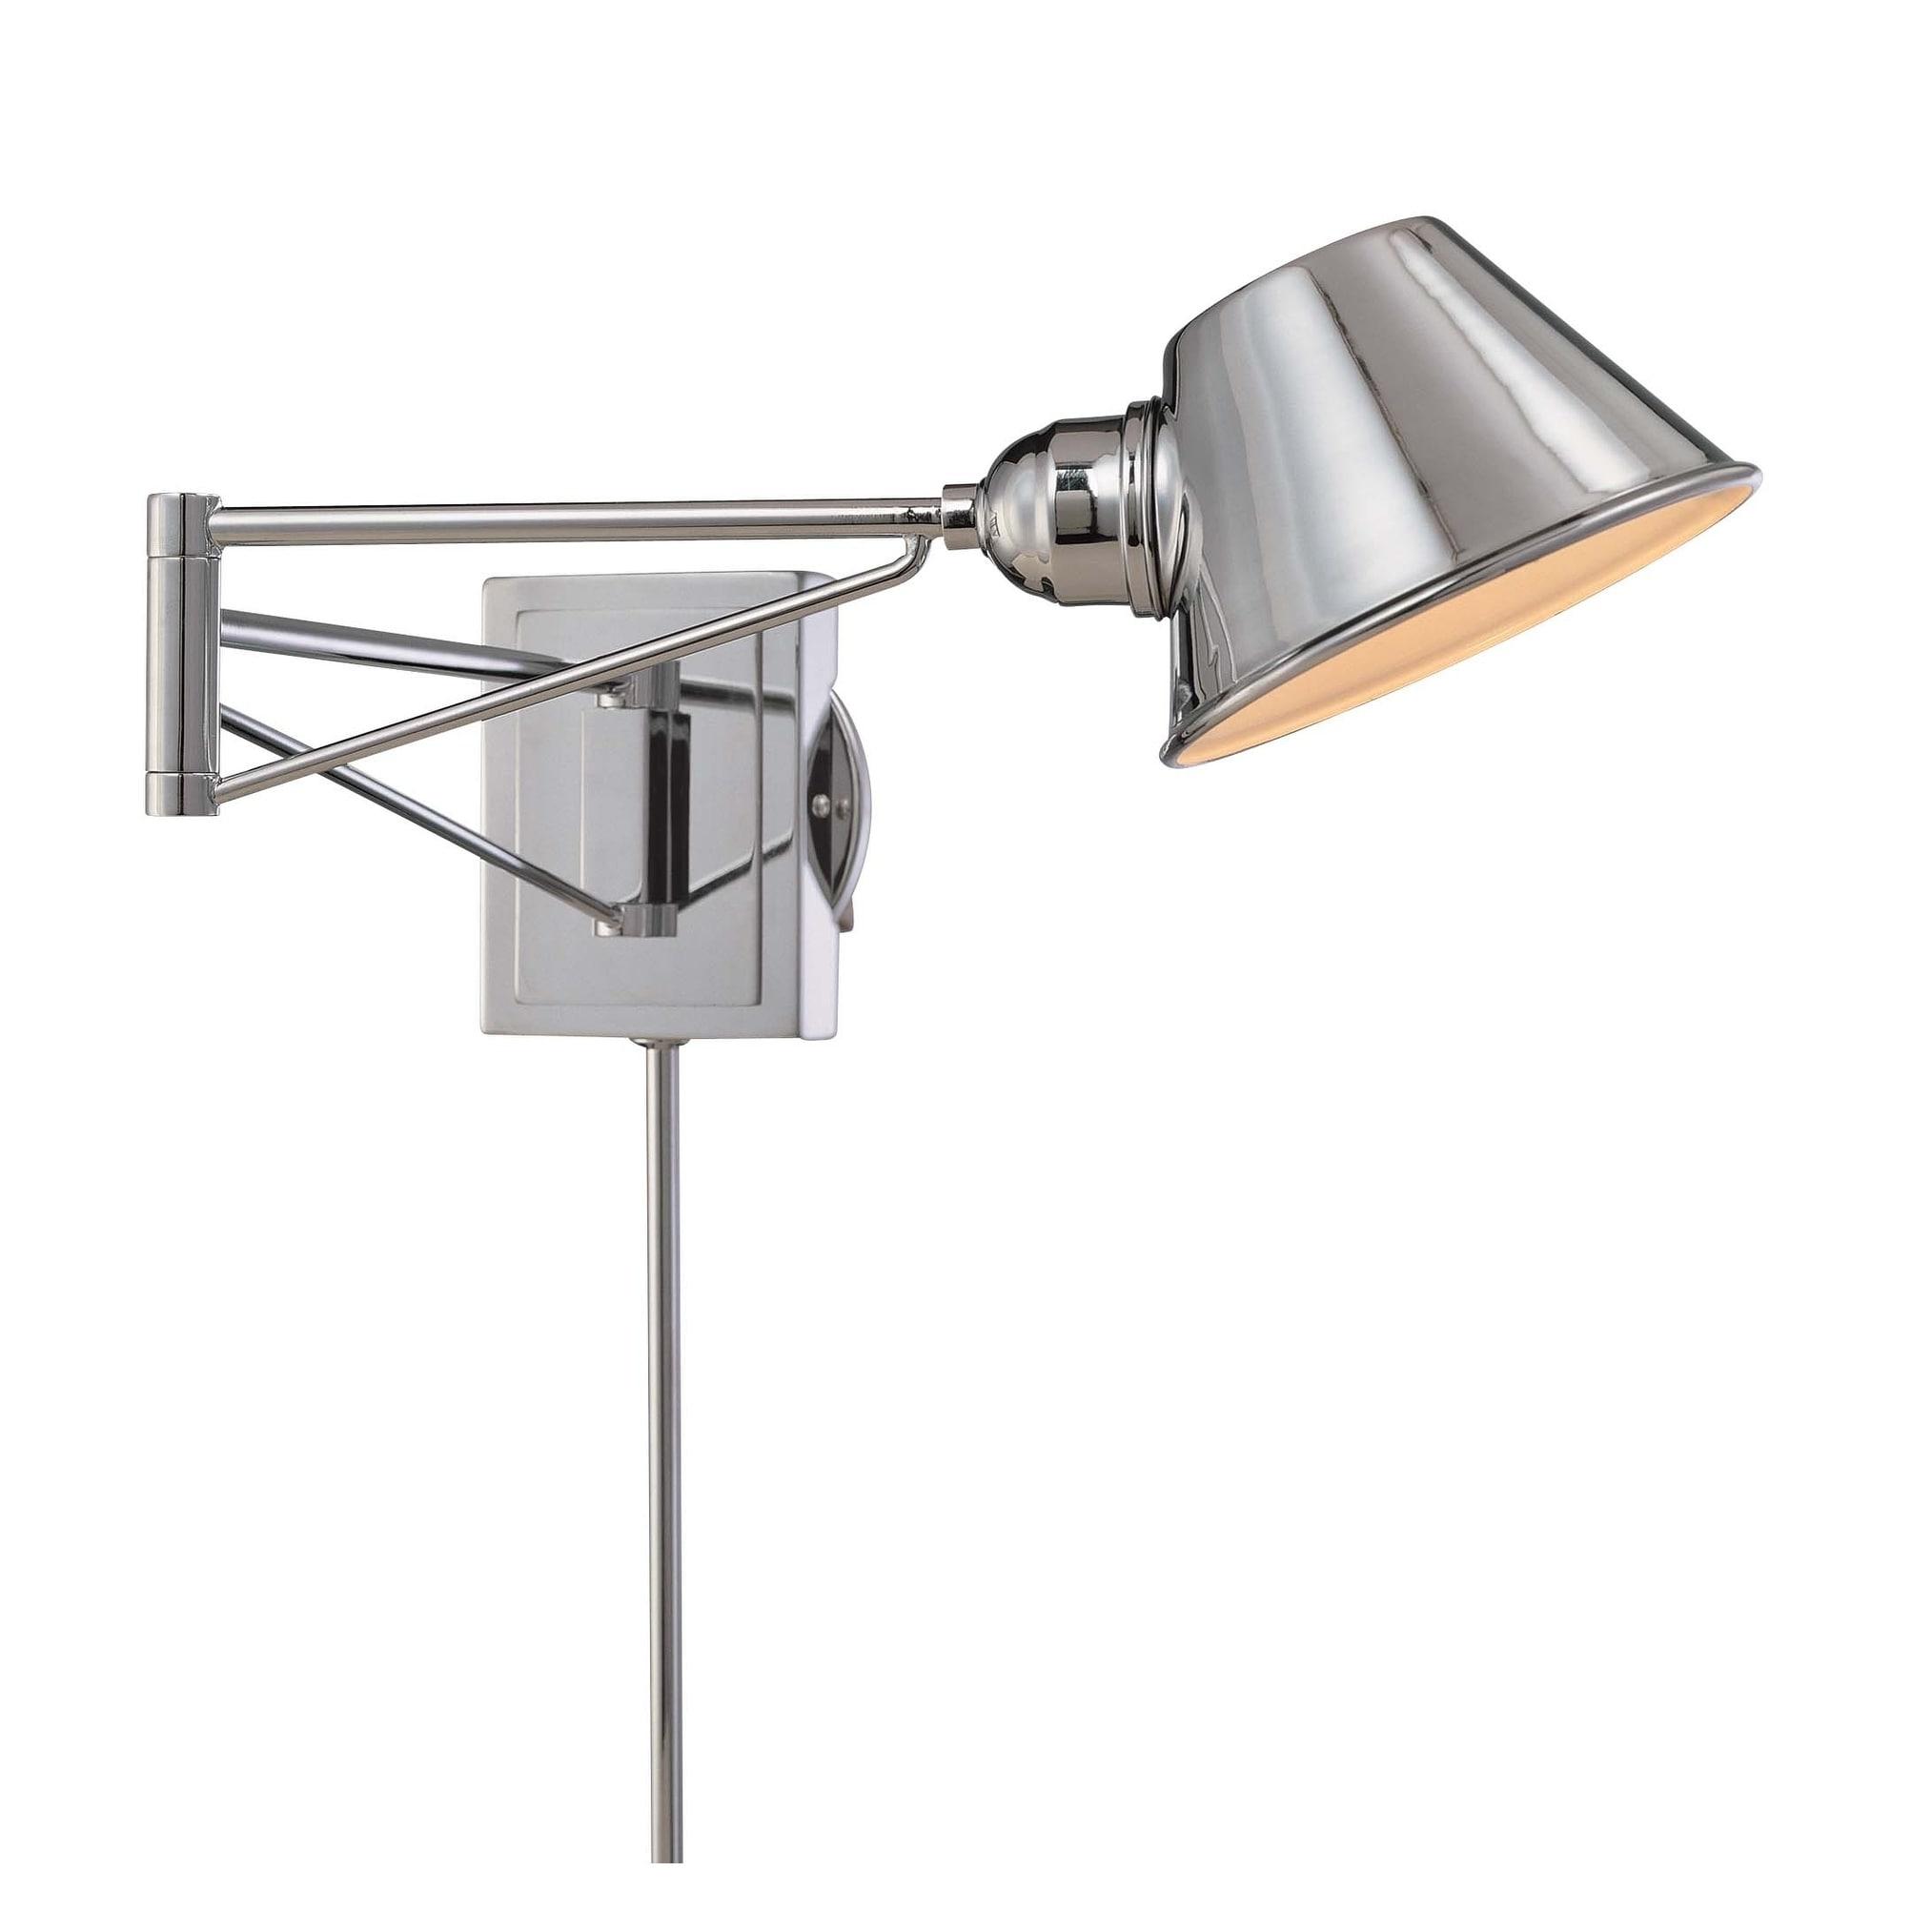 Minka Kovacs 1 Light Swing Arm Wall Sconce Overstock 18069049